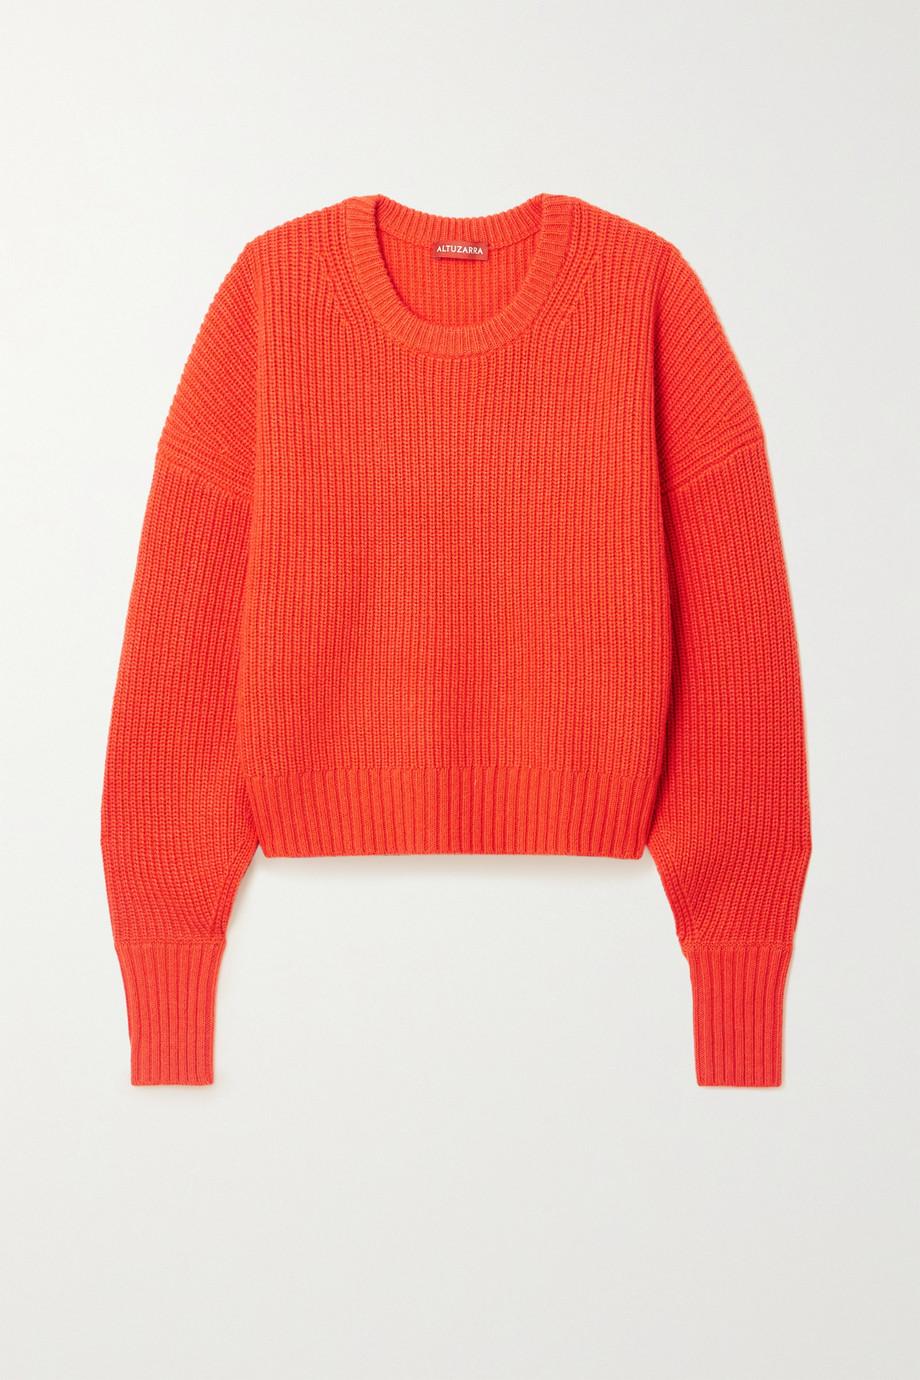 Altuzarra Anthea cutout ribbed cashmere and cotton-blend sweater